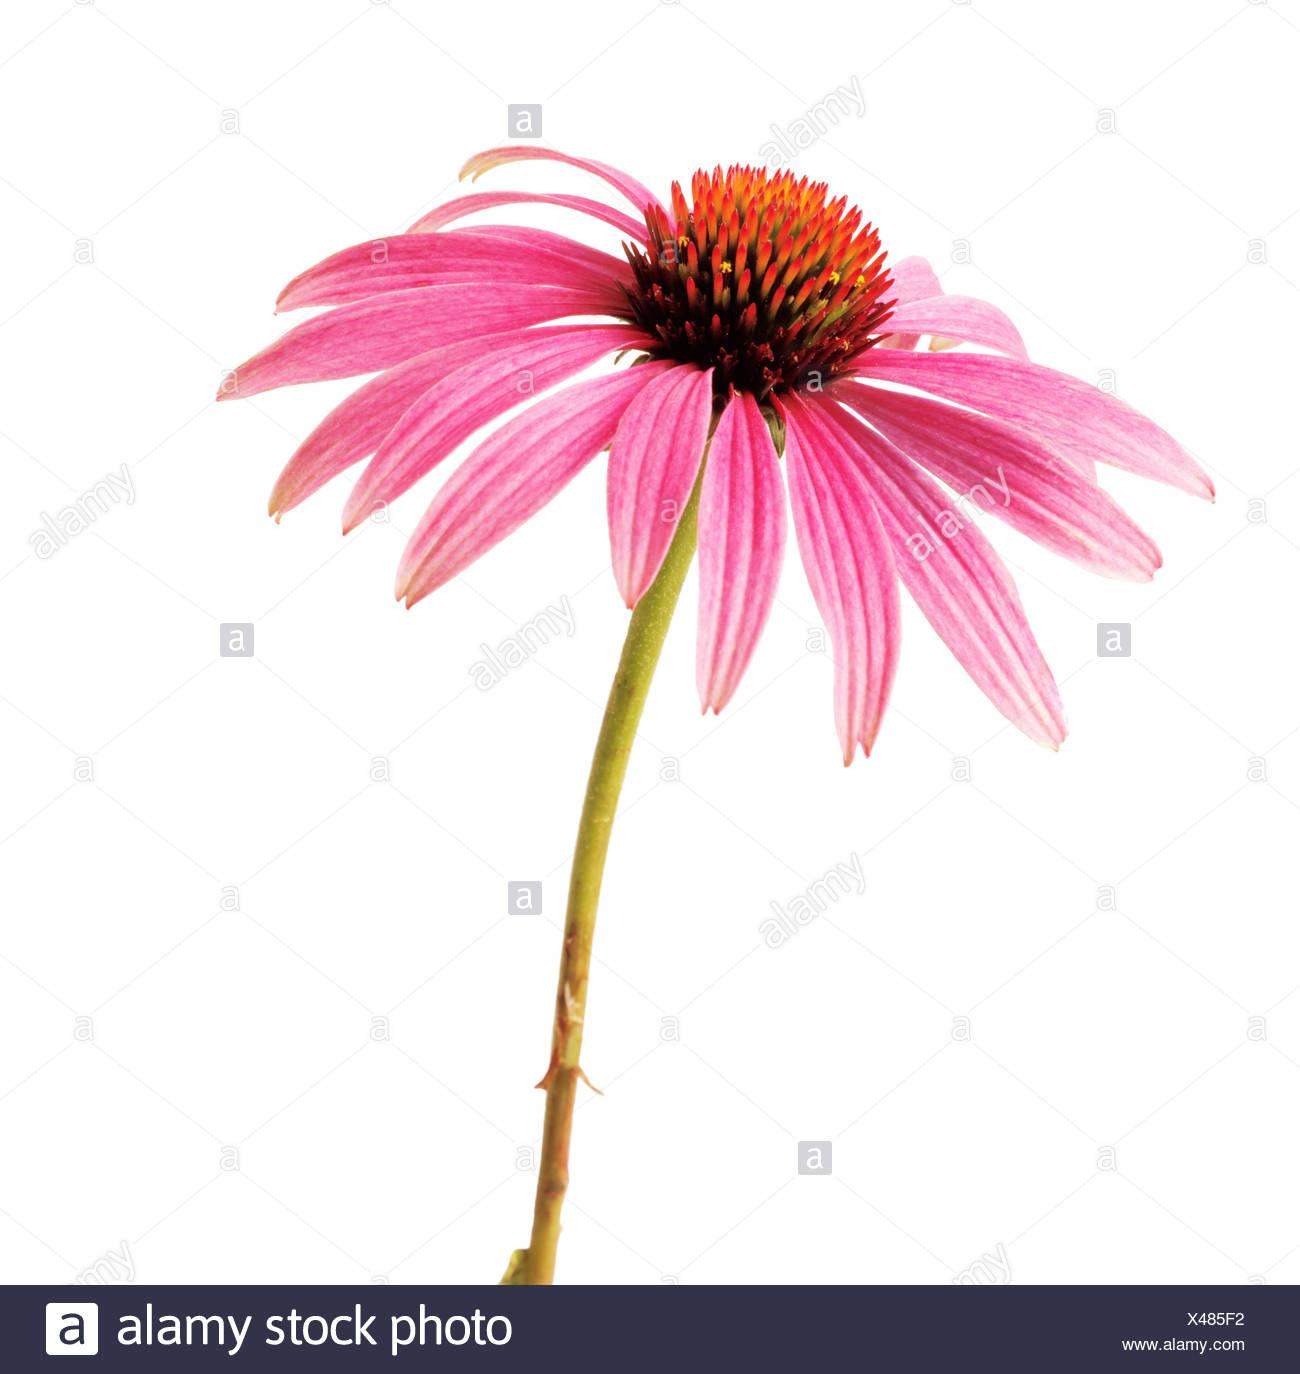 Echinacea Purple Coneflower Single Pink Flower On Stem Against A